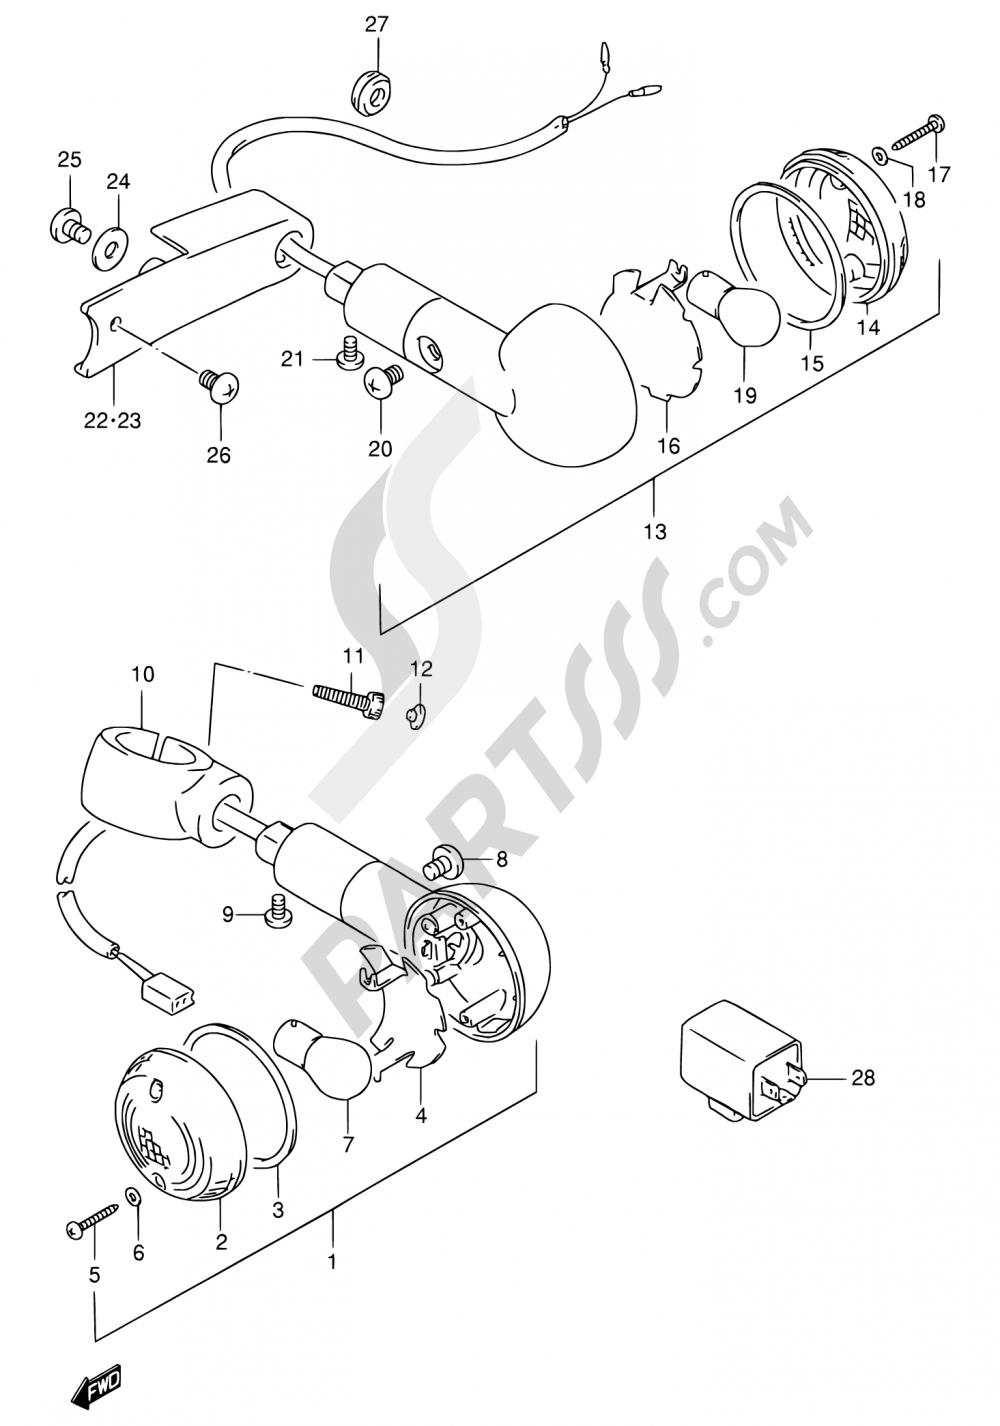 30 - TURN SIGNAL LAMP Suzuki VS1400GLP 1996